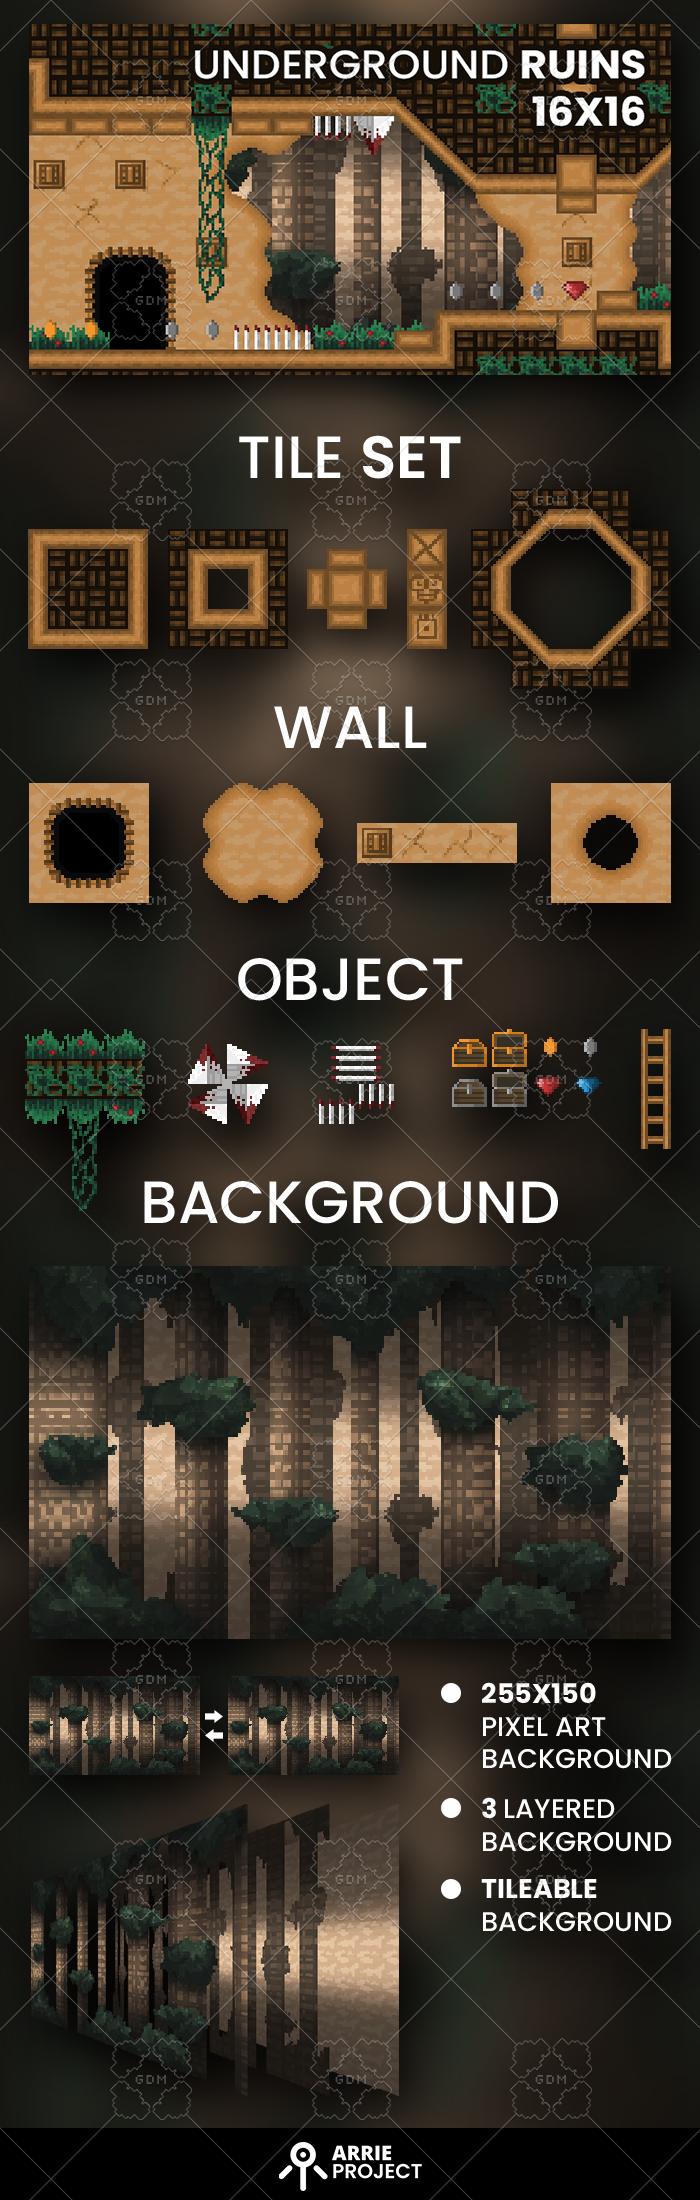 Underground ruins tile set and background